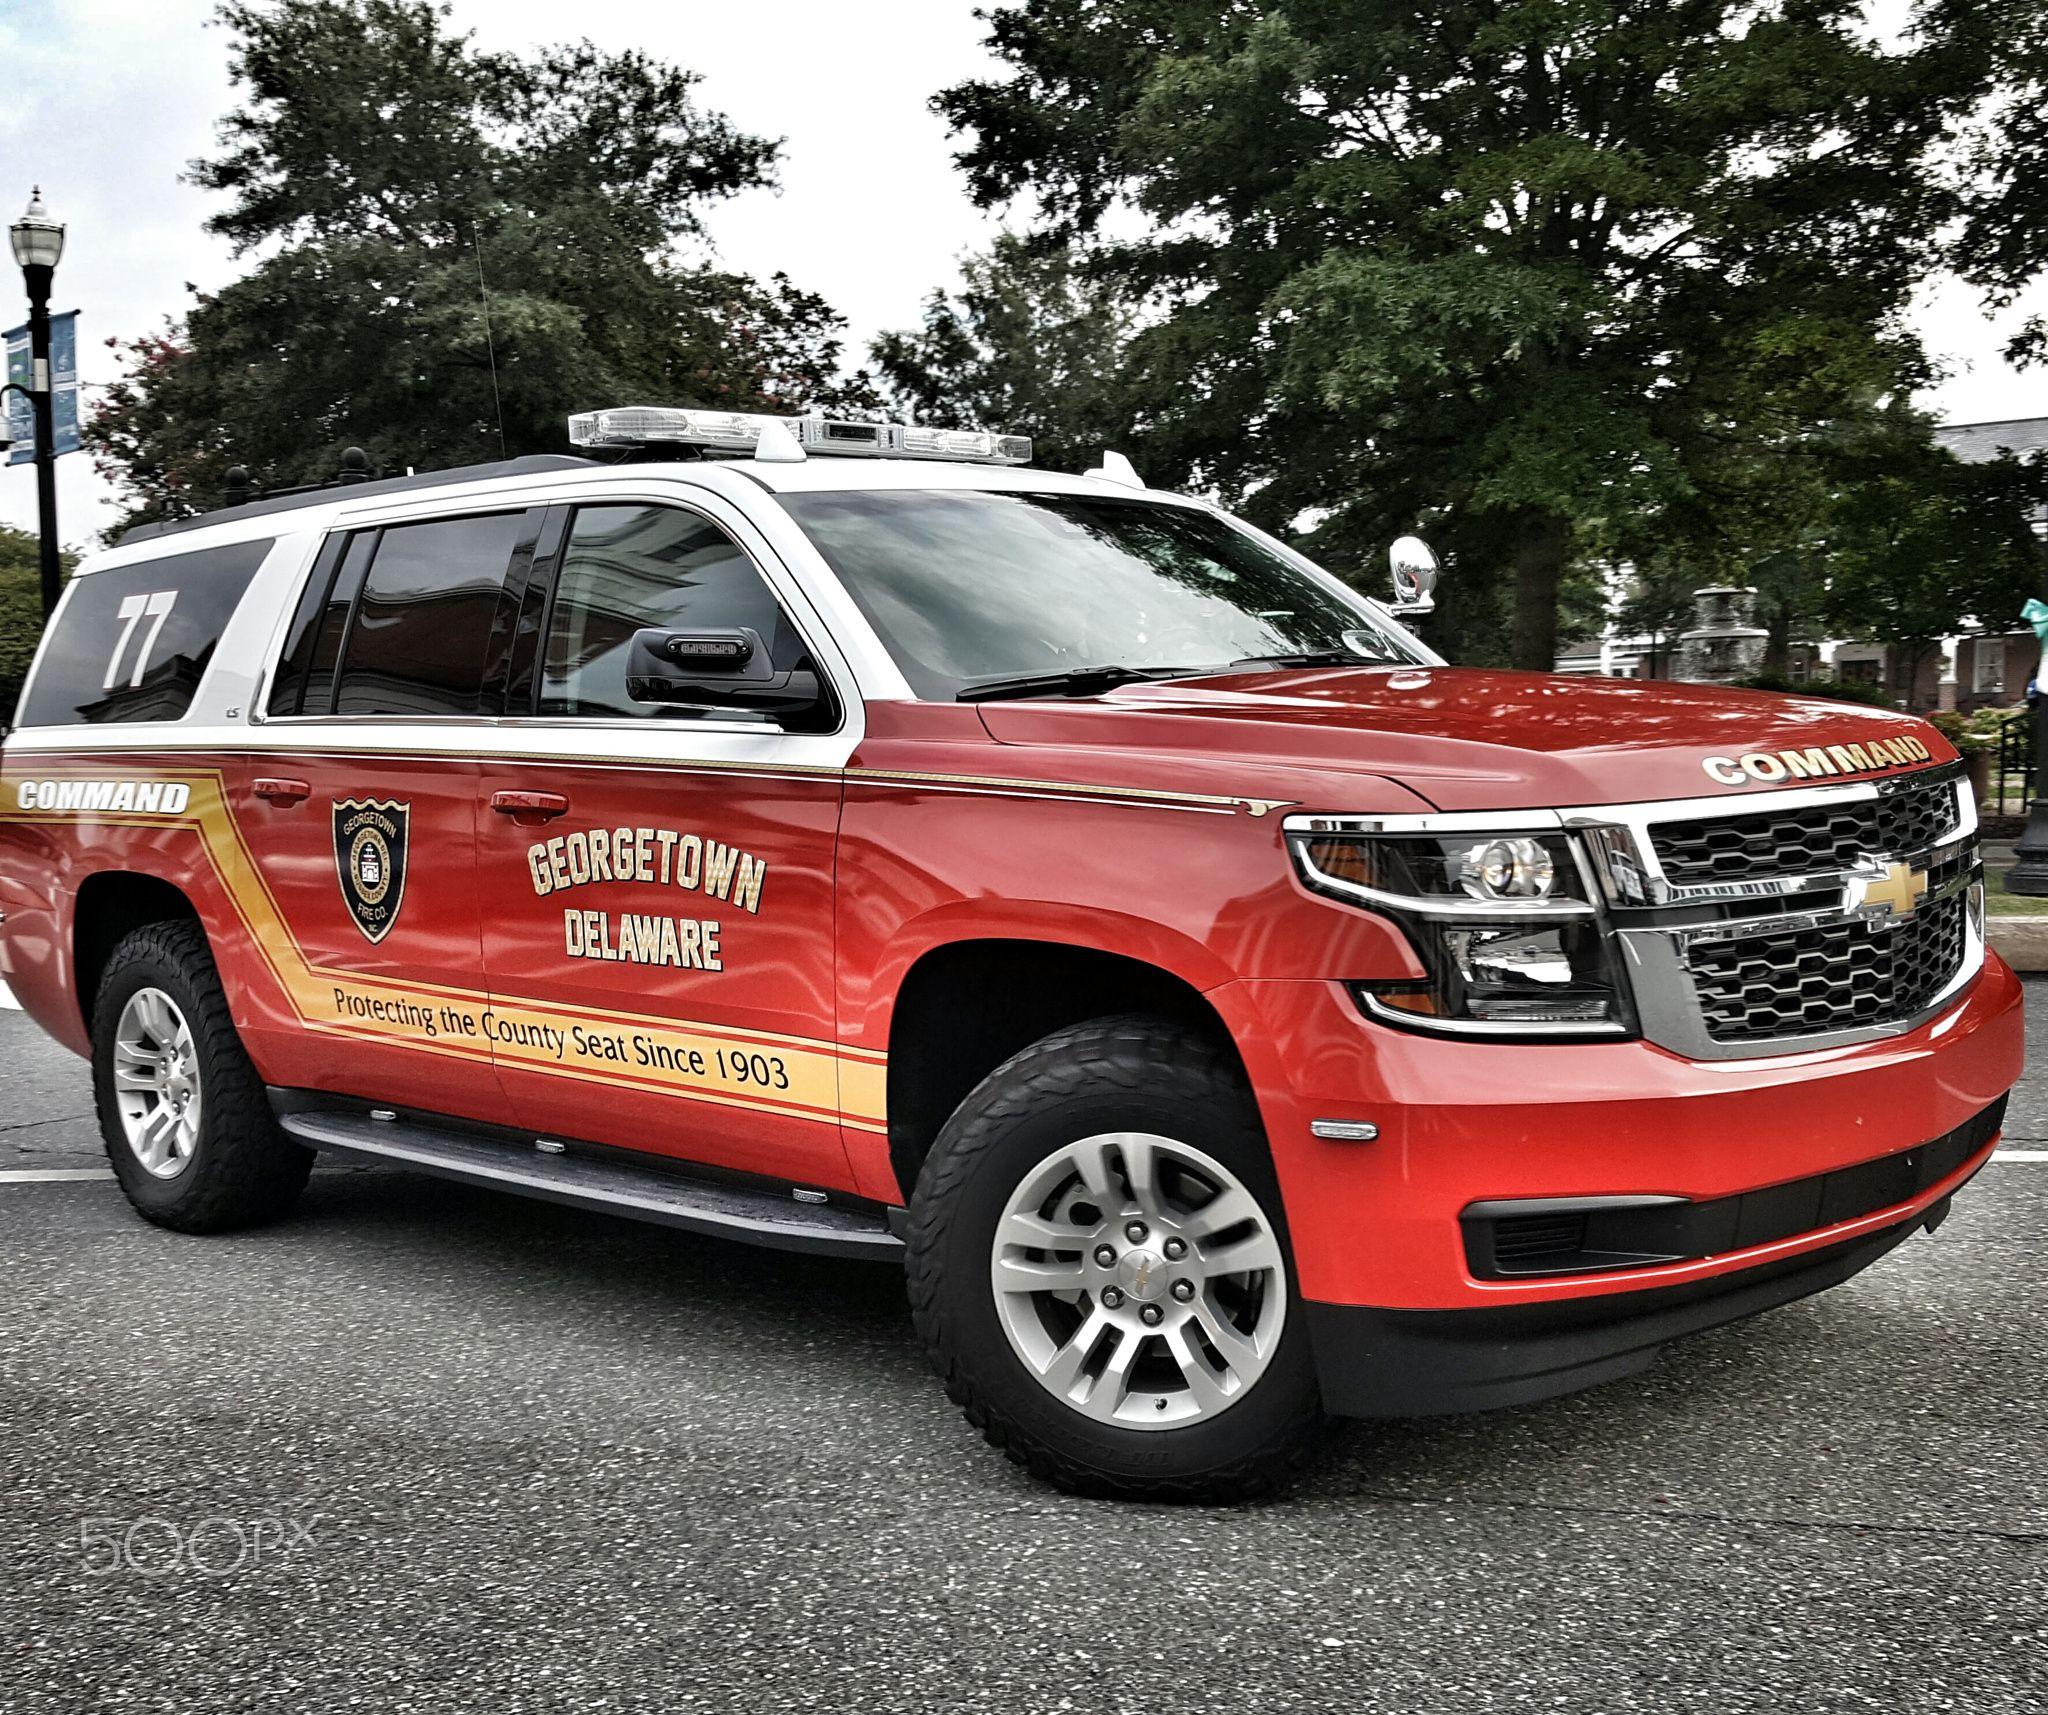 Georgetown Fire Company Command Unit Delaware